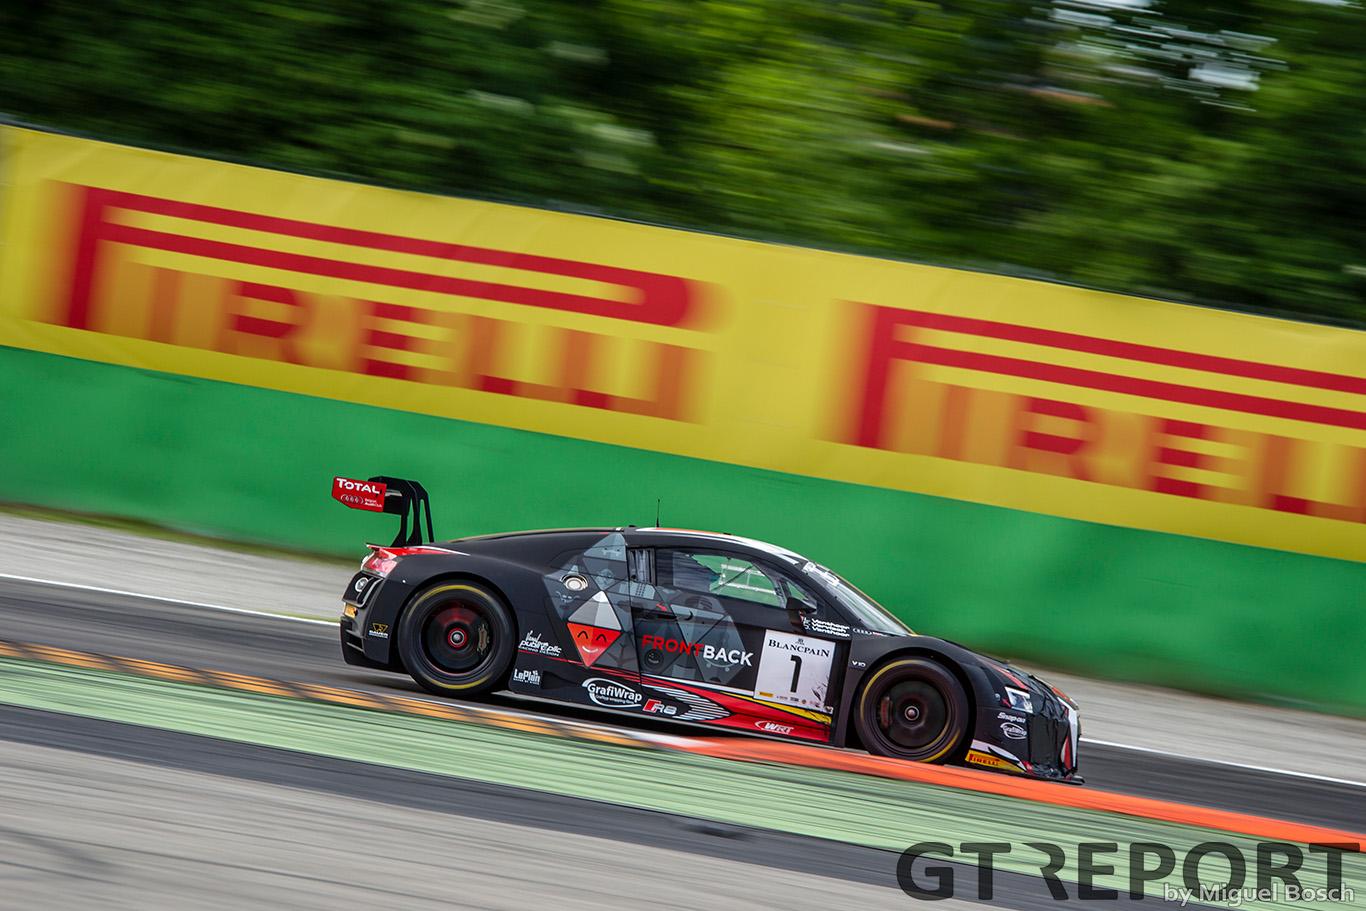 Weekend round-up: WEC, Blancpain GT, 24H Series, Australian GT, Super GT